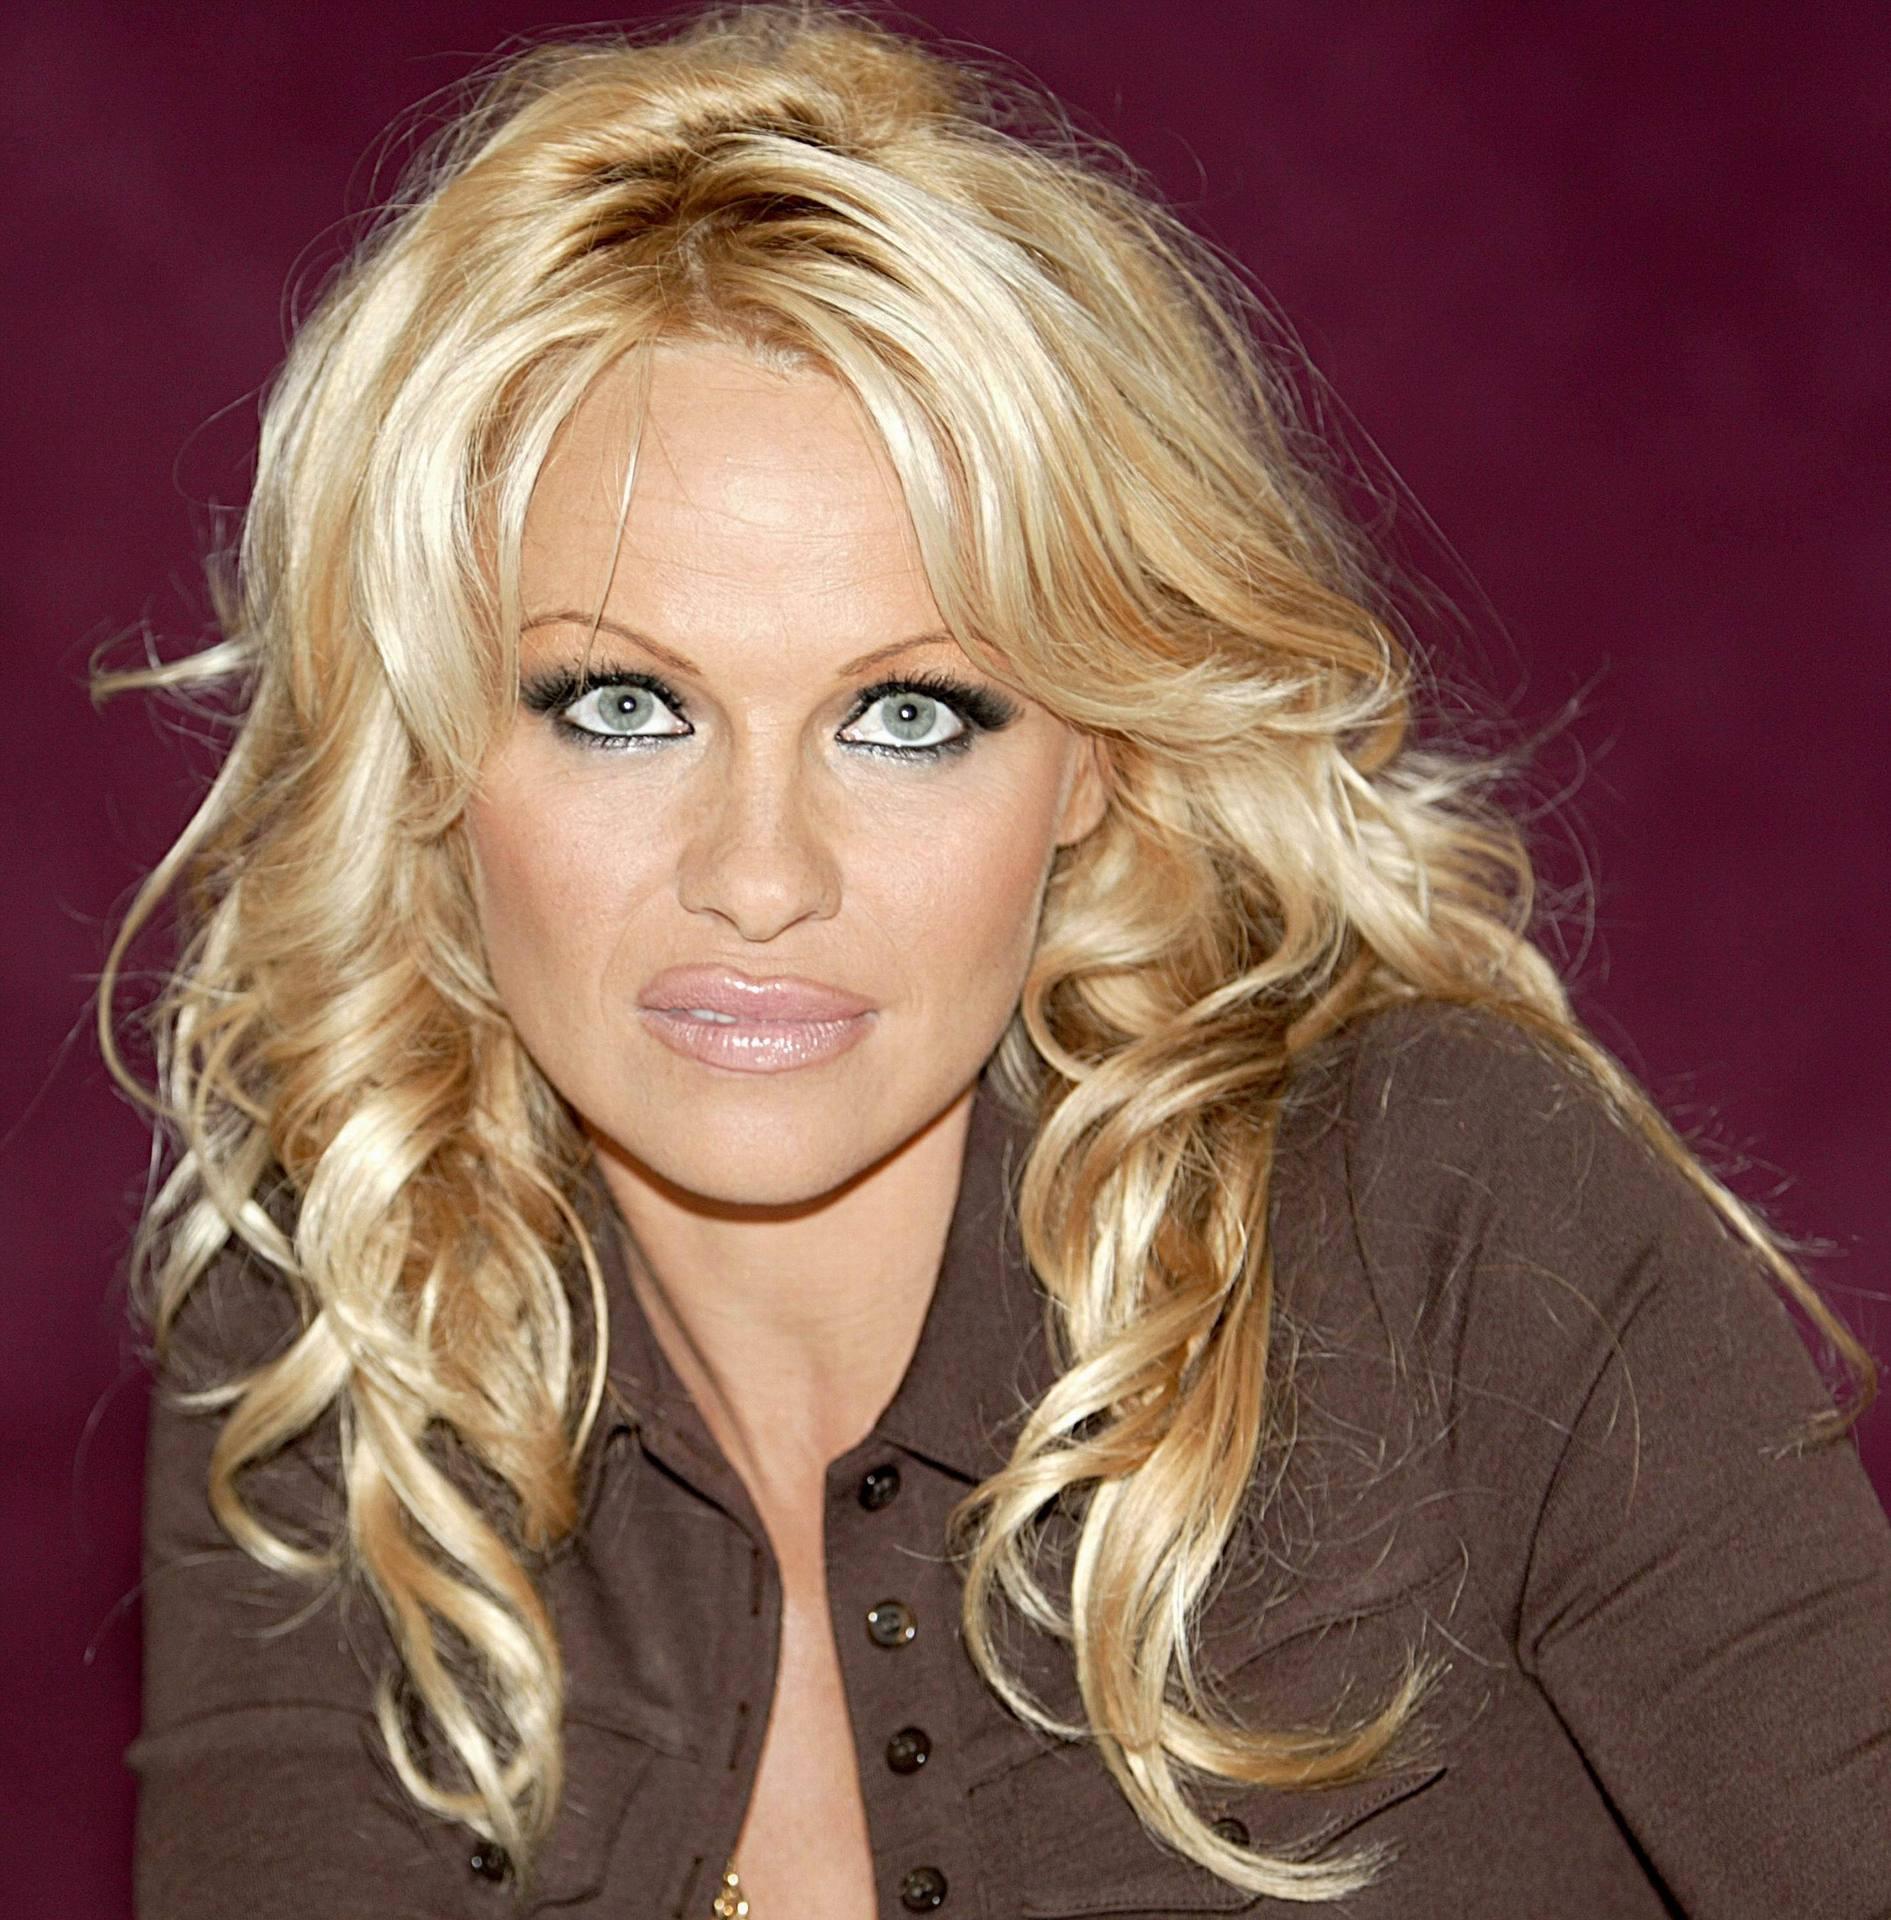 Pamela Anderson - Pamela Anderson Photo (1092504) - Fanpop Pamela Anderson